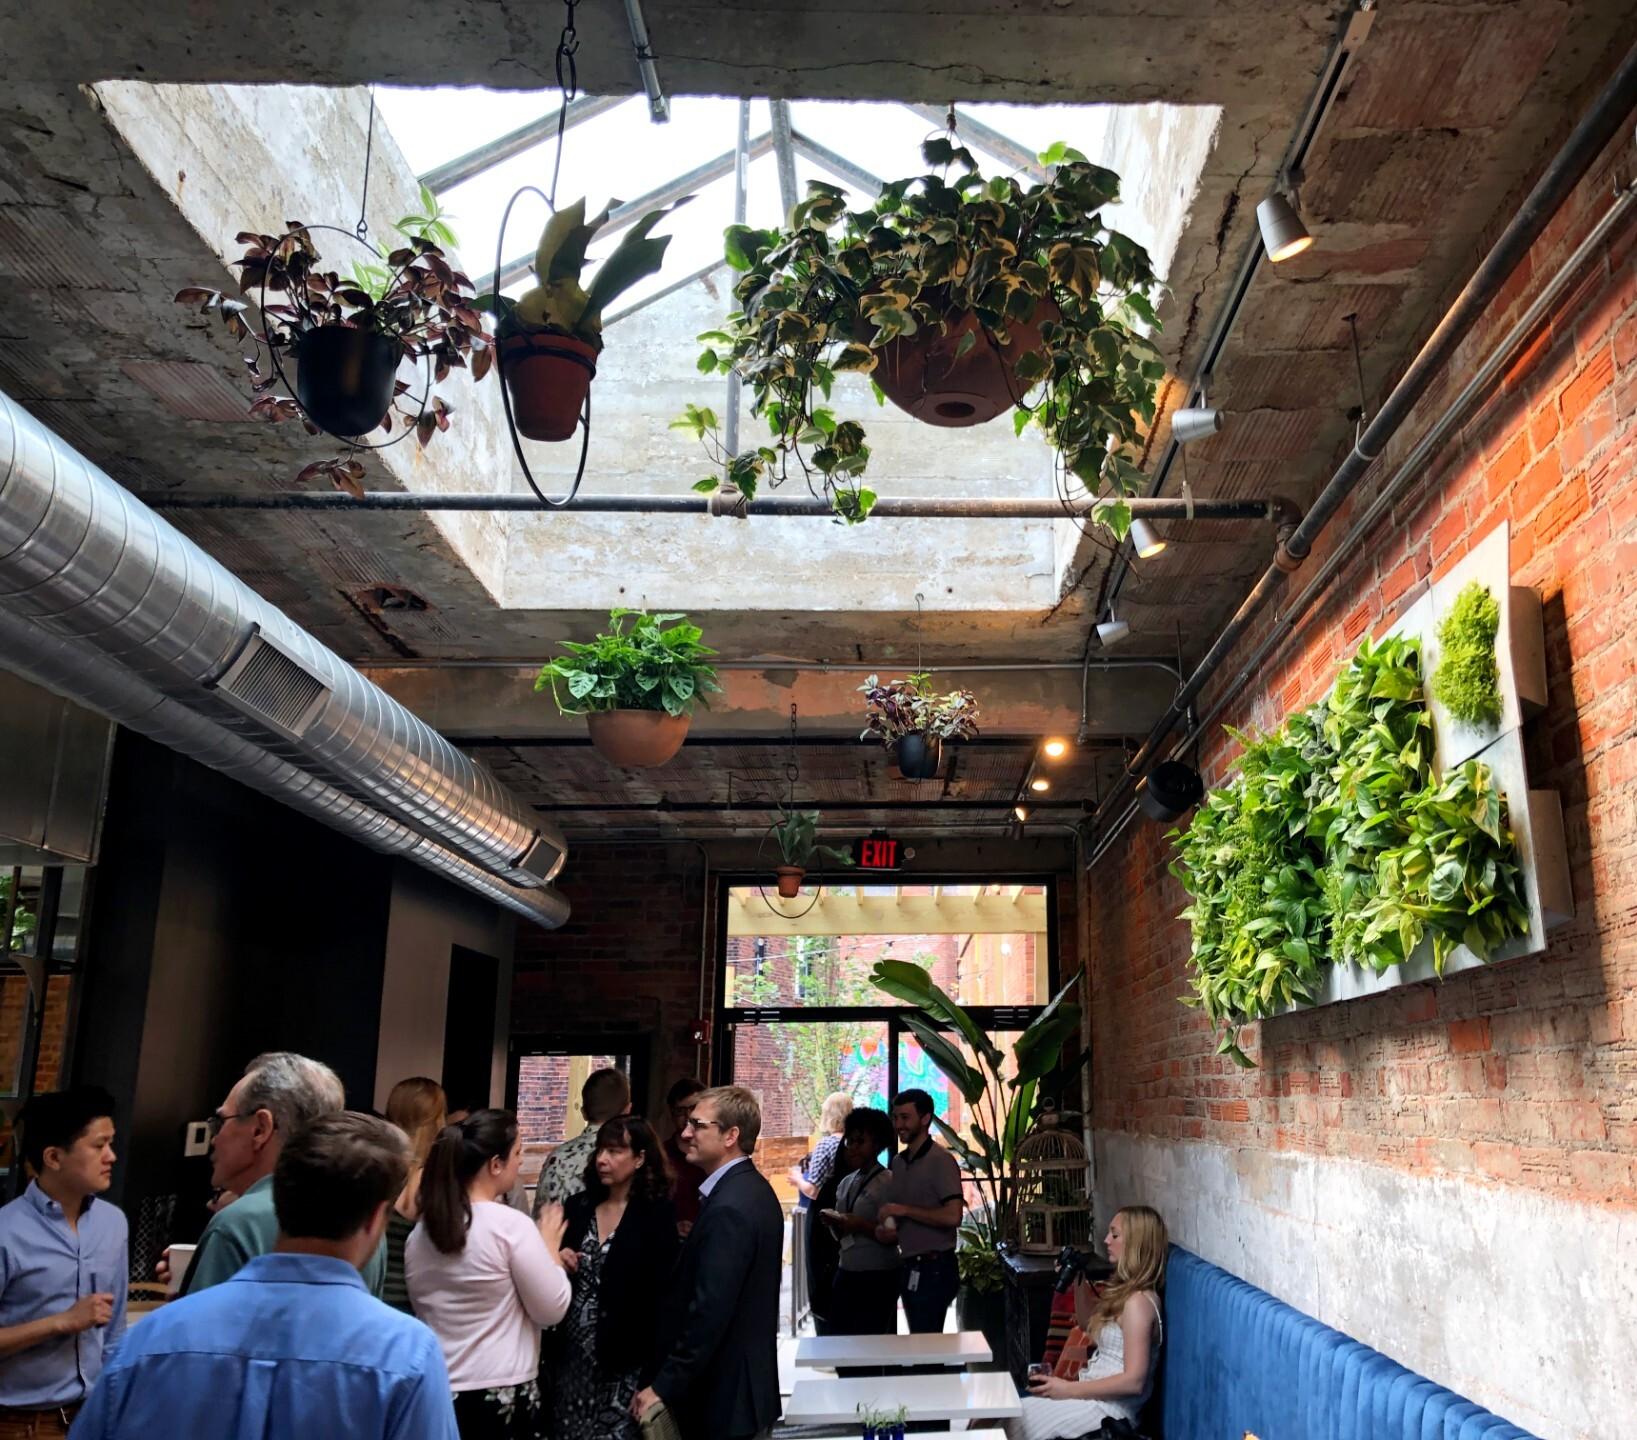 Comfort_Station_Interior_Plants.jpg